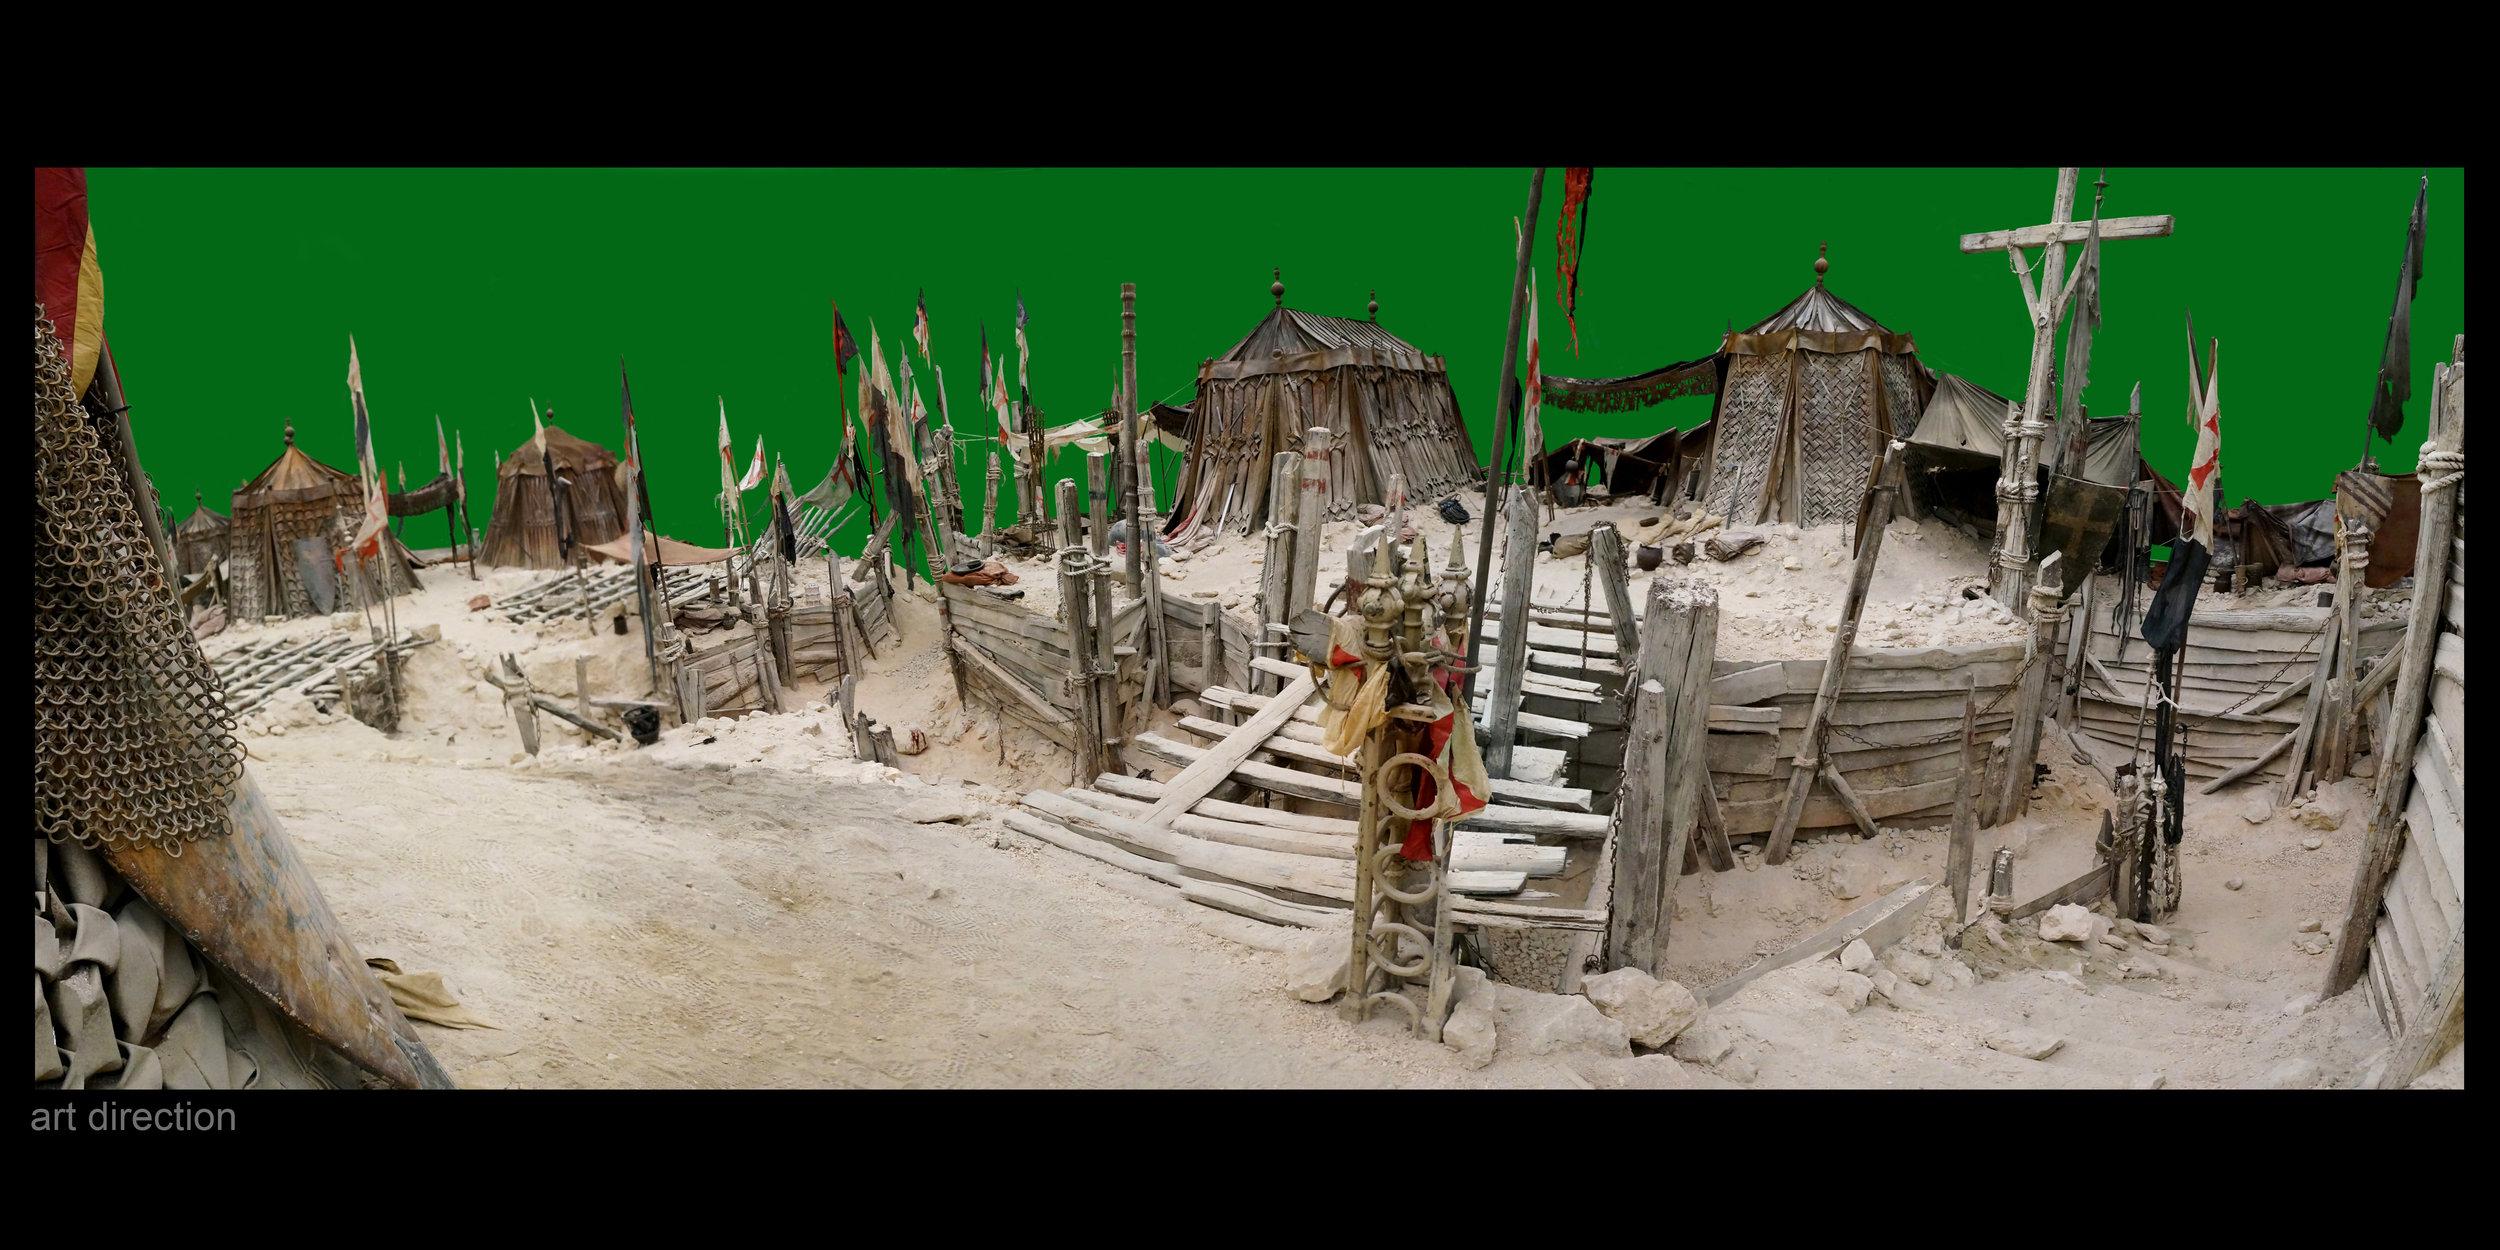 encampment-01.jpg